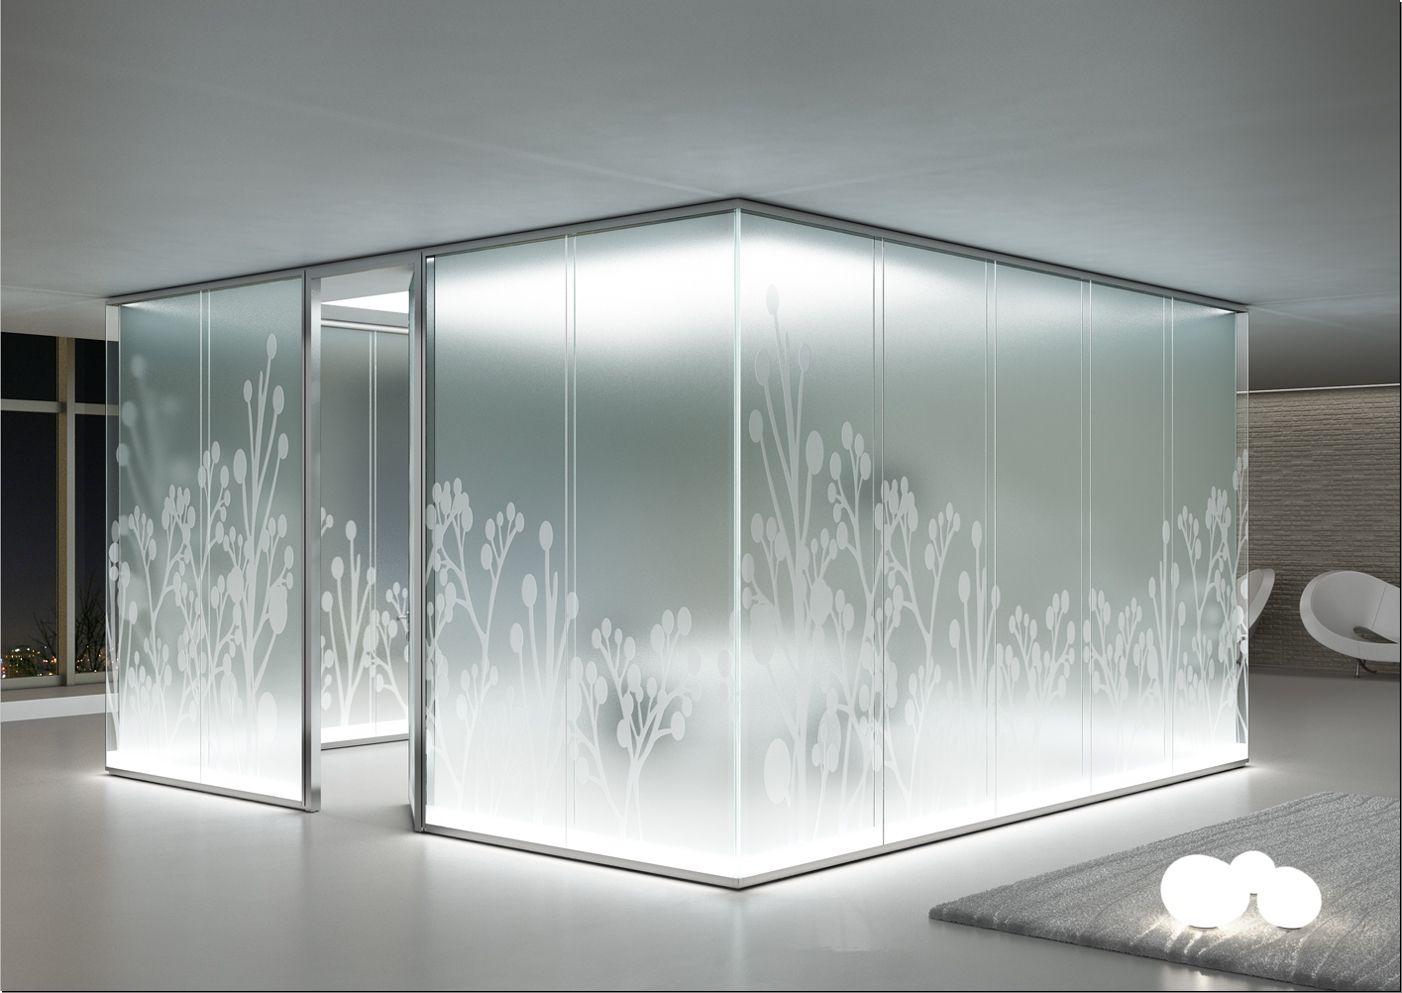 Fresh Office Parion Walls Used 25256 Furniture Singapore Joo Seng Parions Los Angeles Panels Canterbury